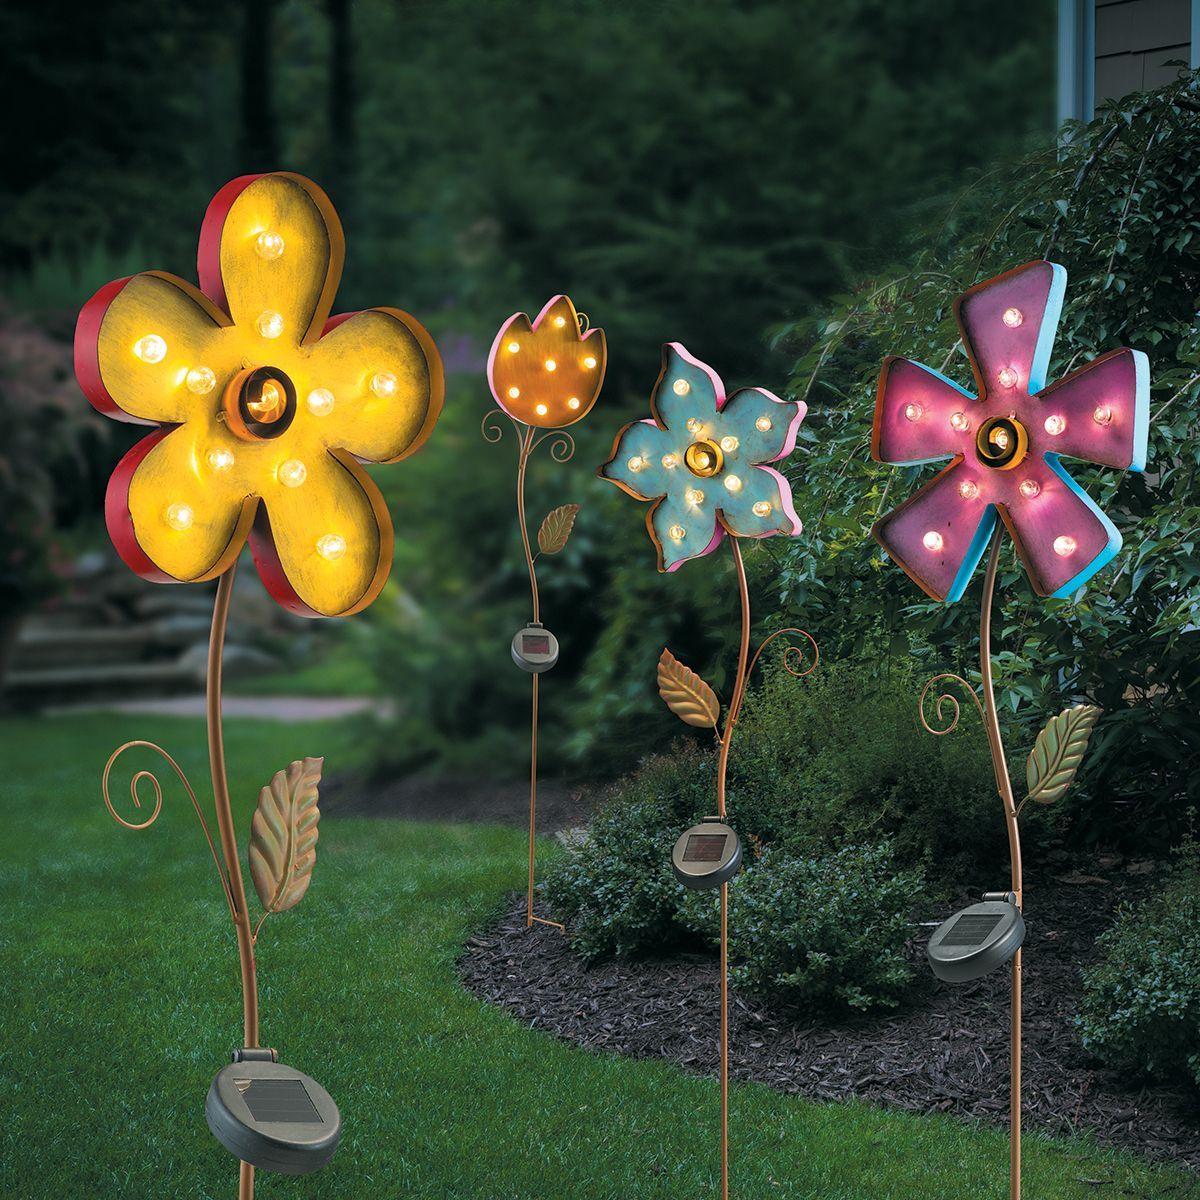 Solar Lighted Metal Flower Yard Stake   Yard decorations, Walkways ...